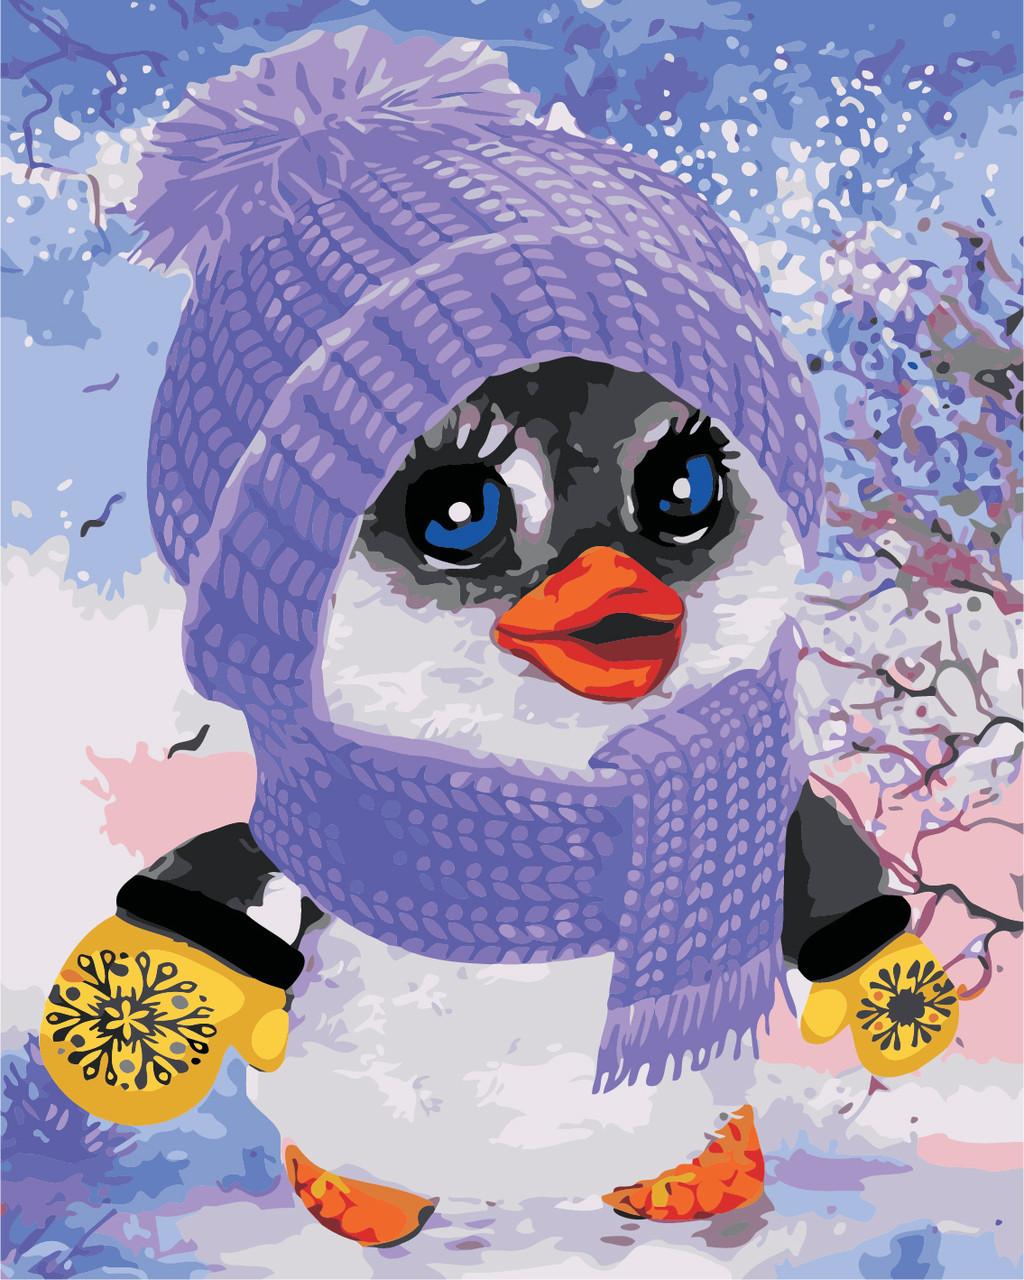 Картина по номерам Пингвинчик 40 х 50 см (AS0406)